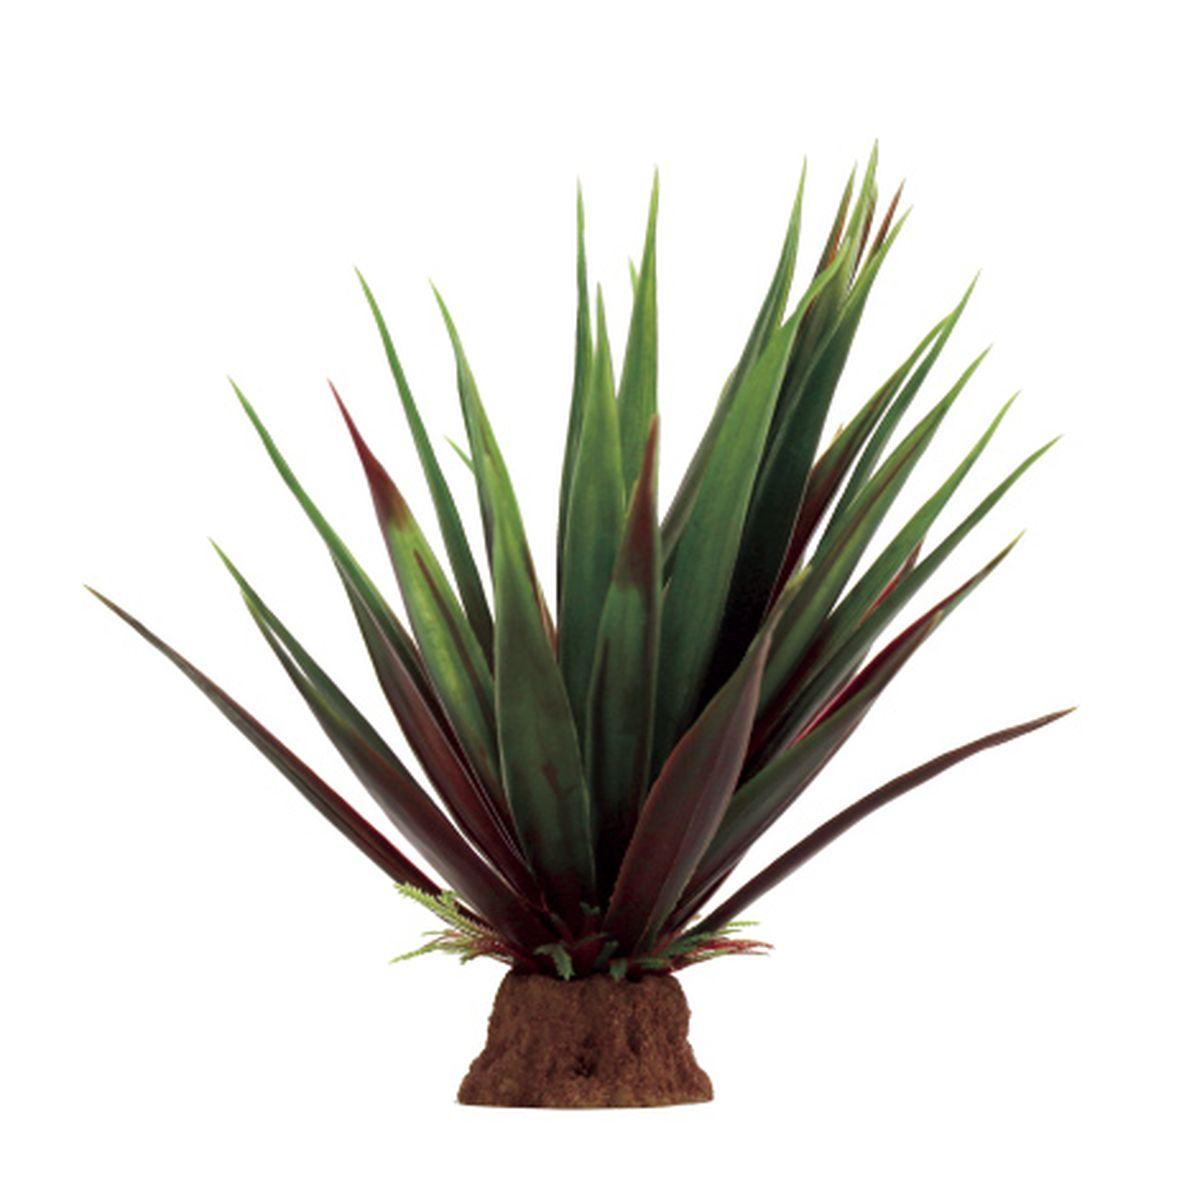 Растение для аквариума ArtUniq Агава красно-зеленая, 13 x 13 x 16 см декорация для аквариума artuniq пористый камень 20 5 x 10 5 x 18 8 см